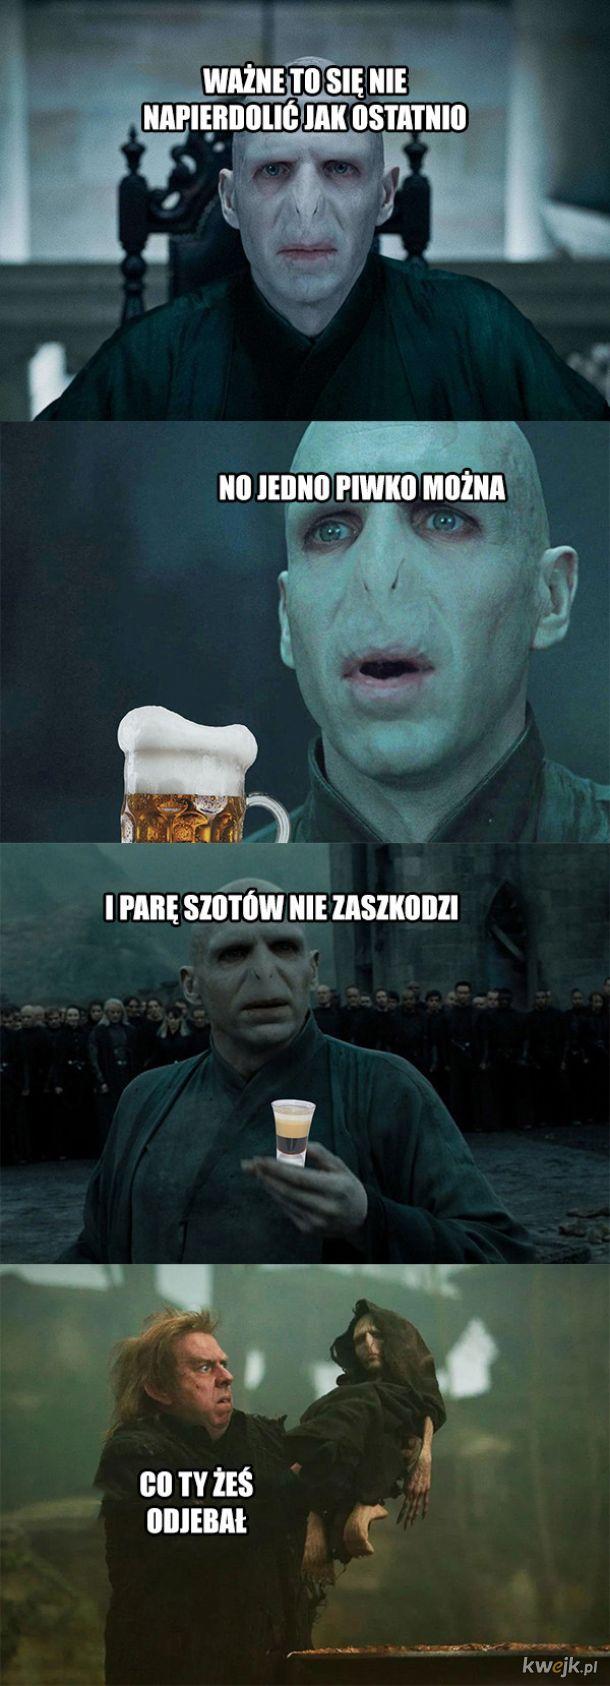 Szoty